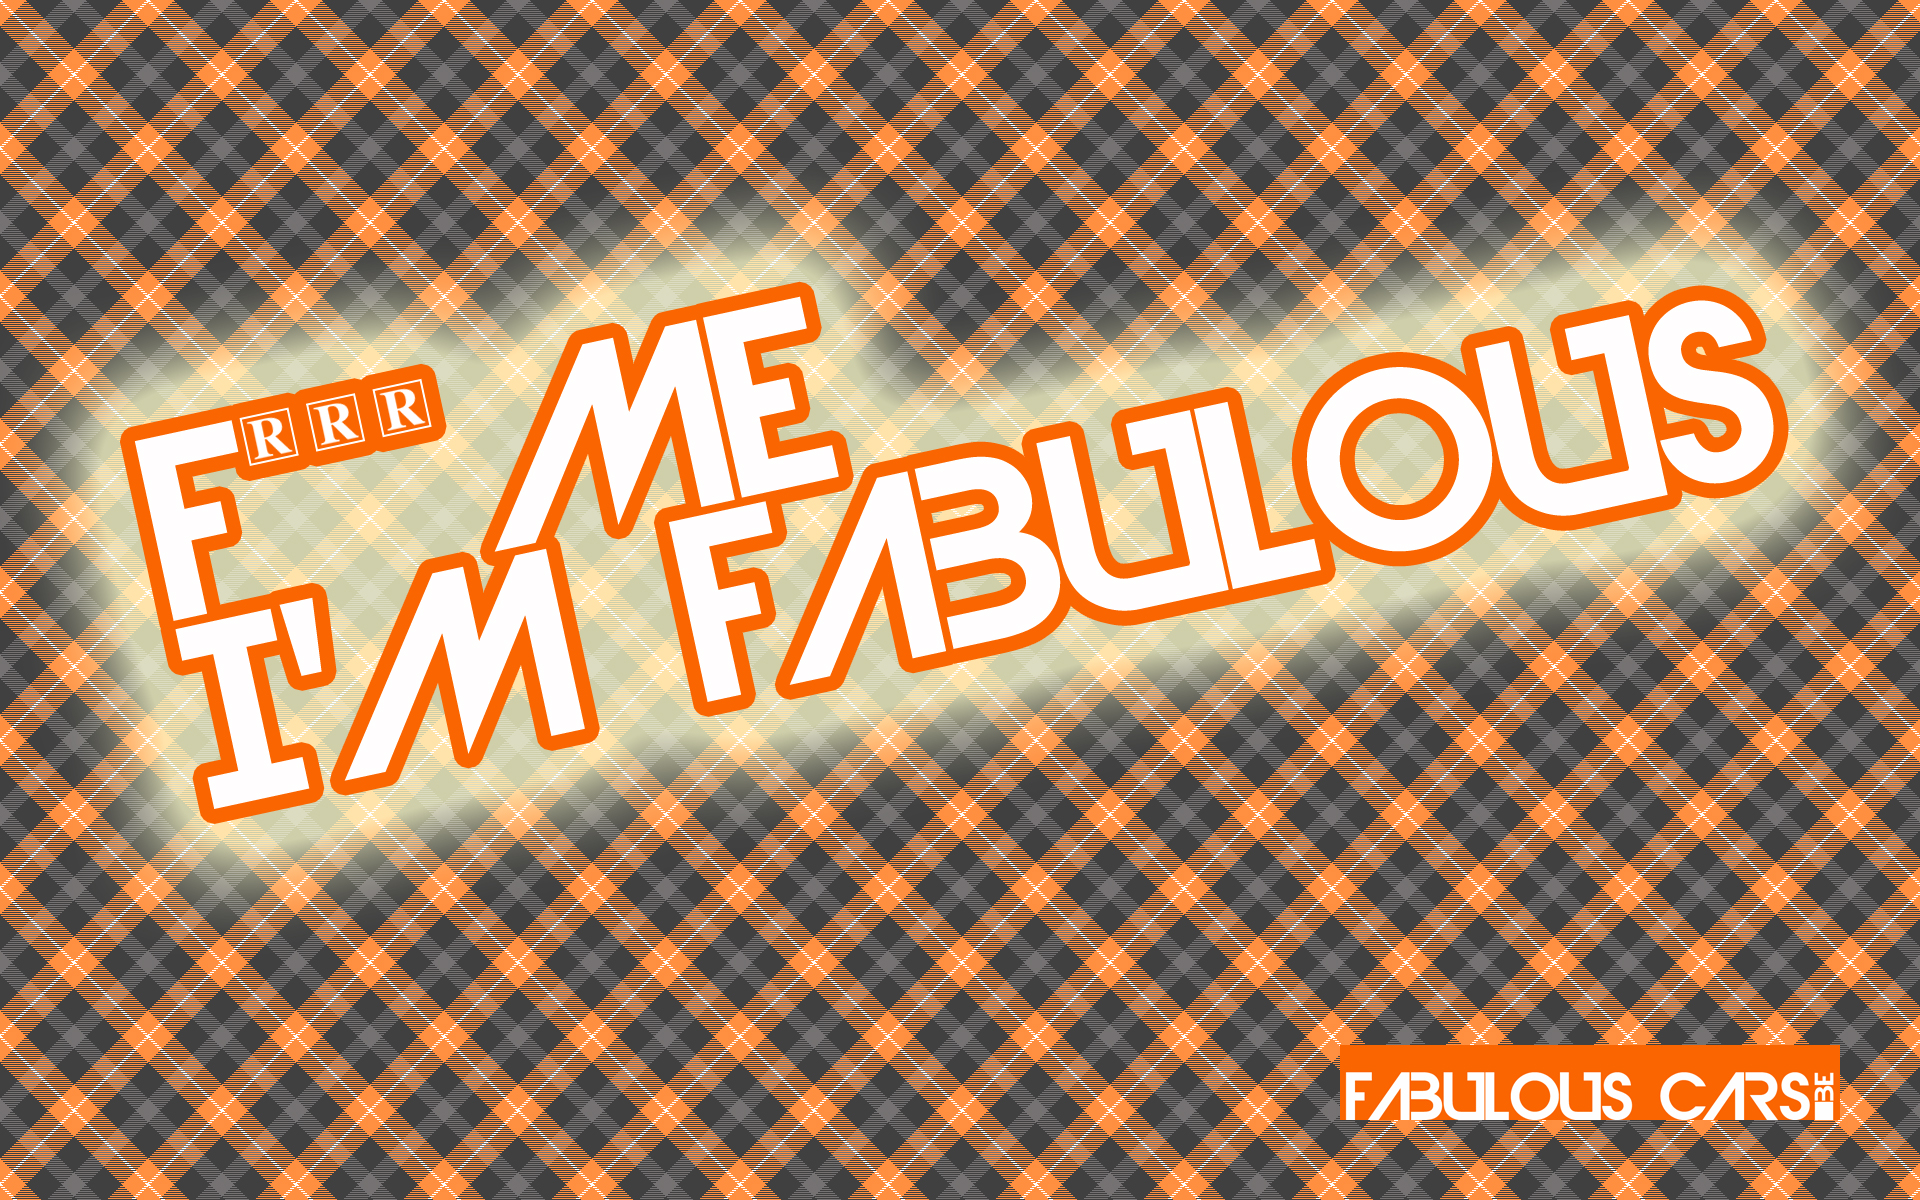 Fabulous wallpaper   625175 1920x1200